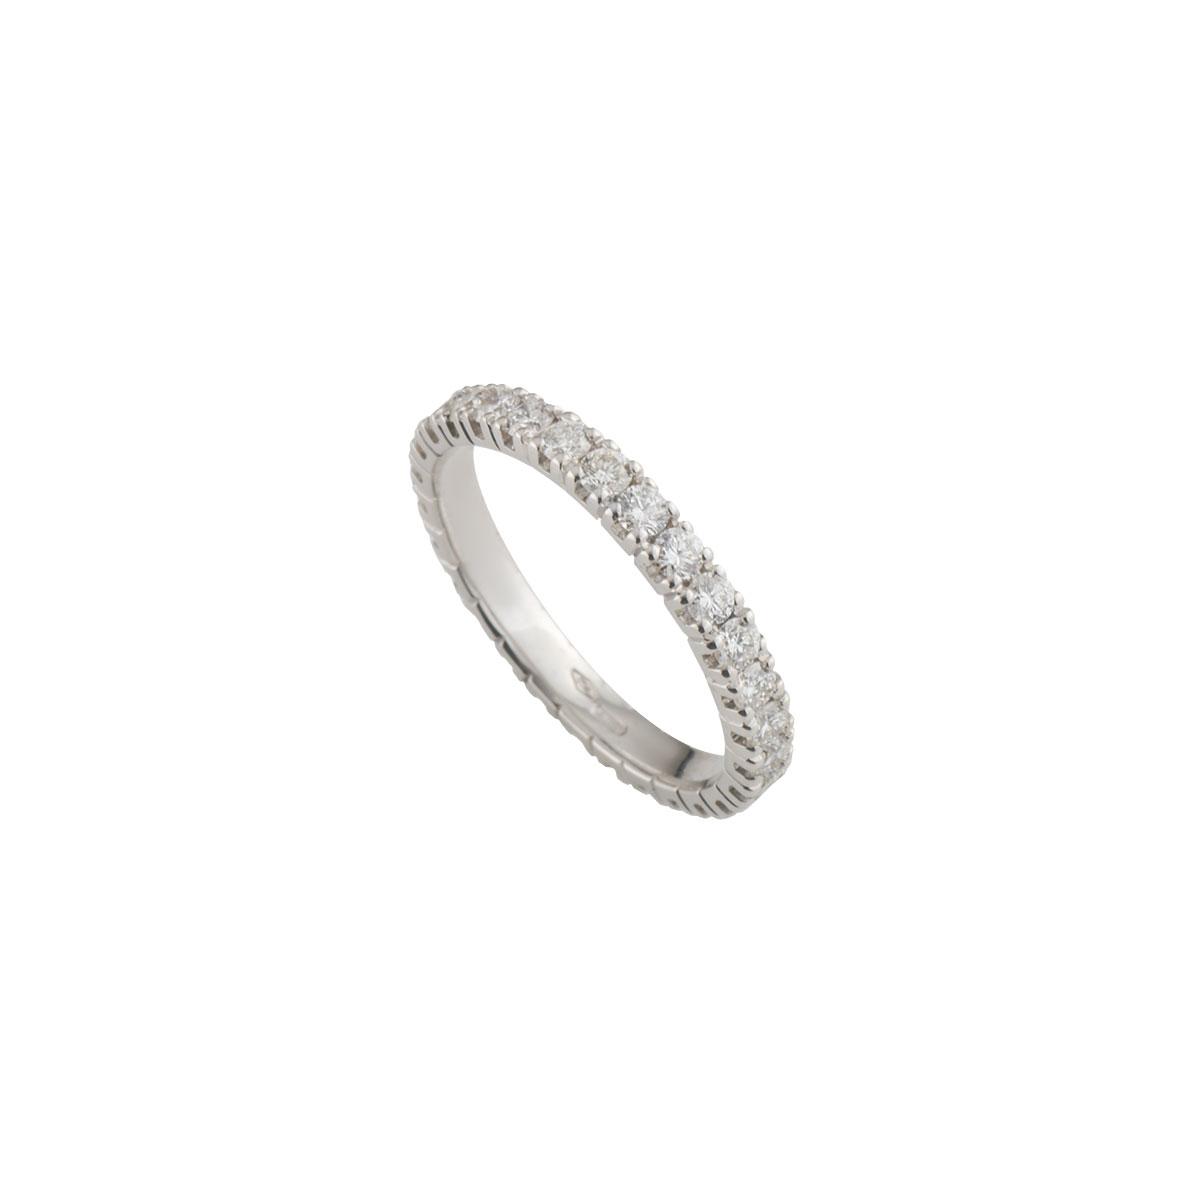 White GoldDiamond Ring 1.15ct G/VS